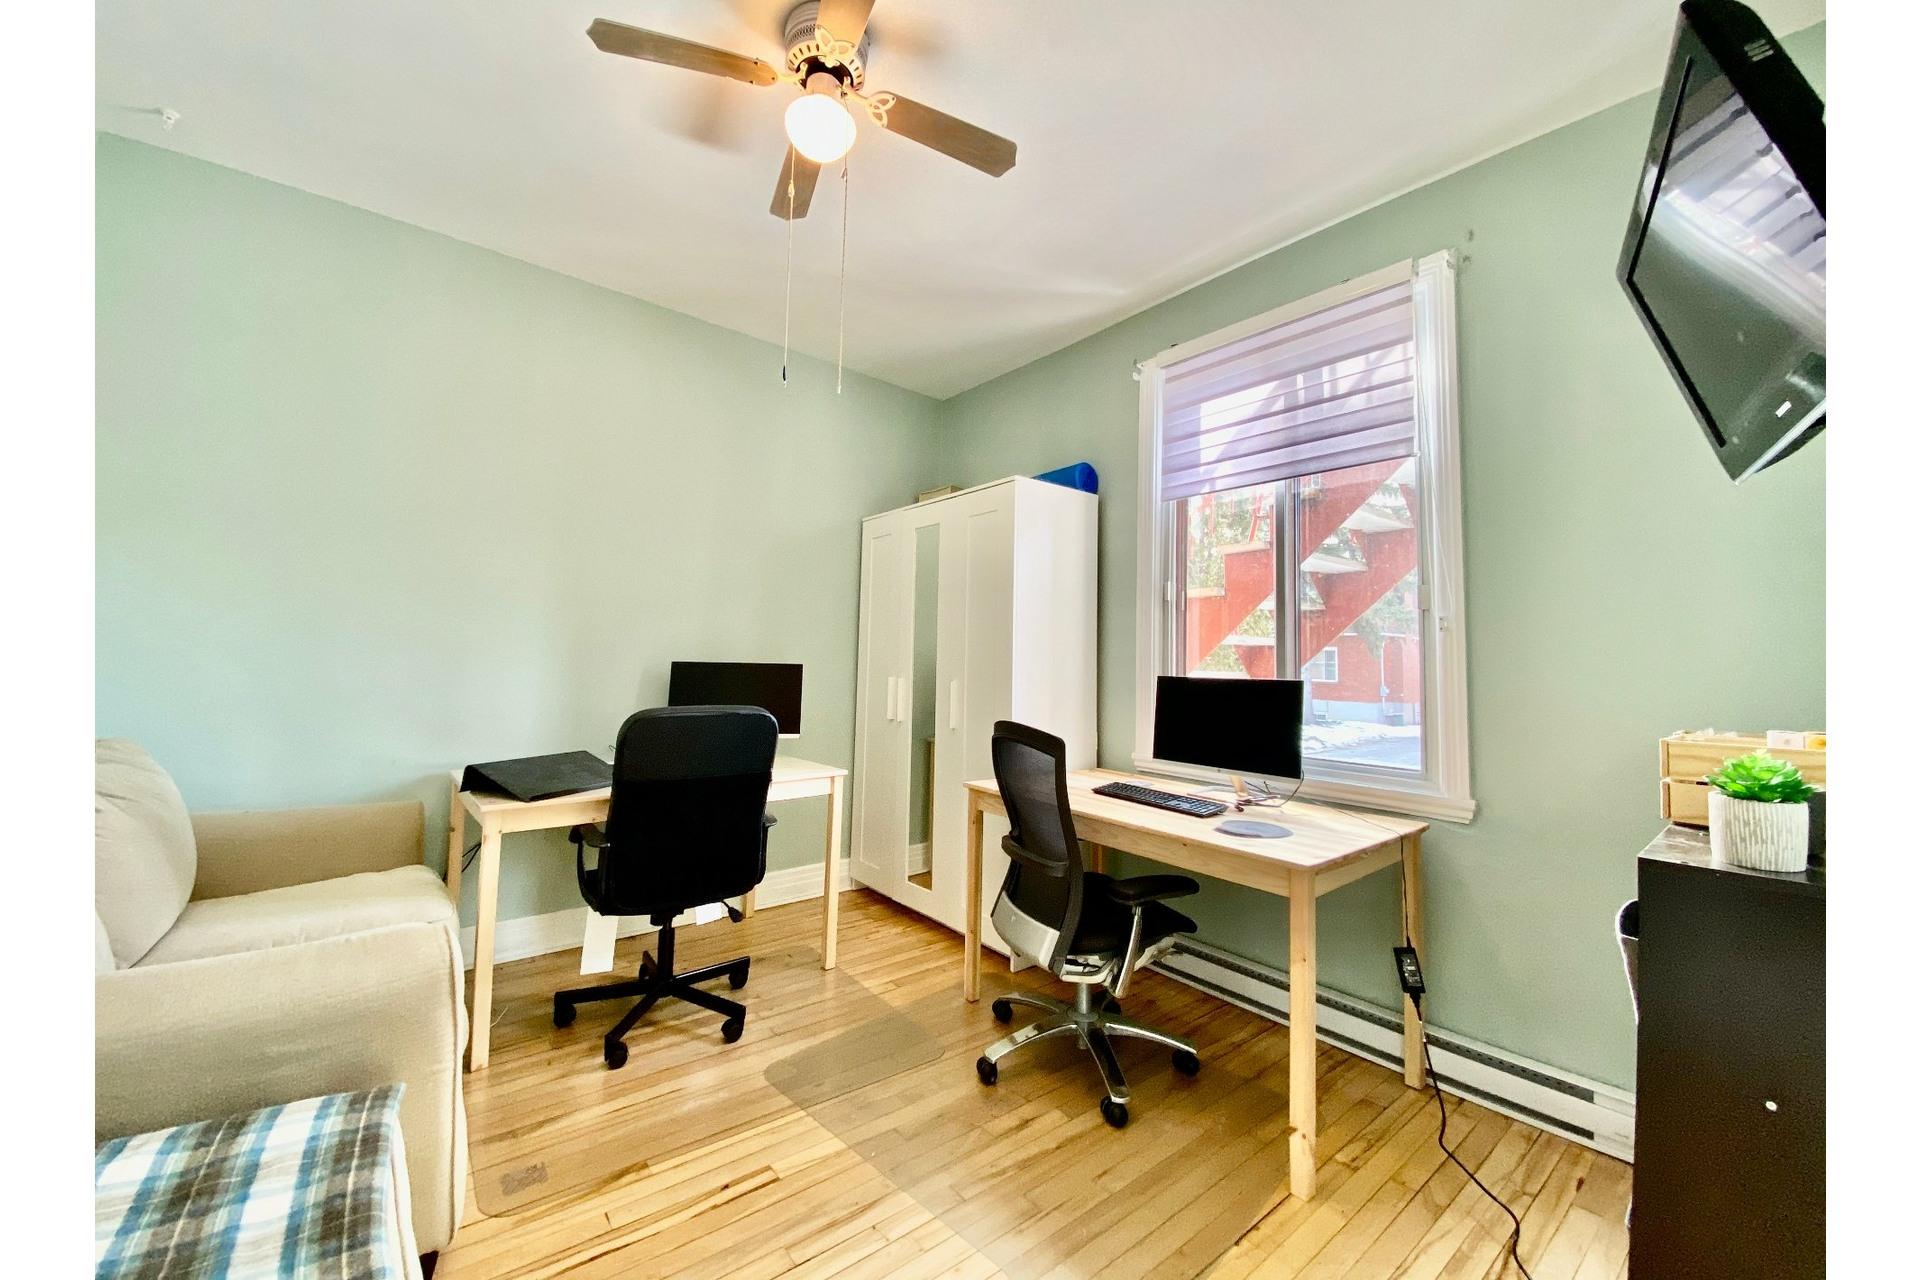 image 15 - Duplex En venta Lachine Montréal  - 6 habitaciones